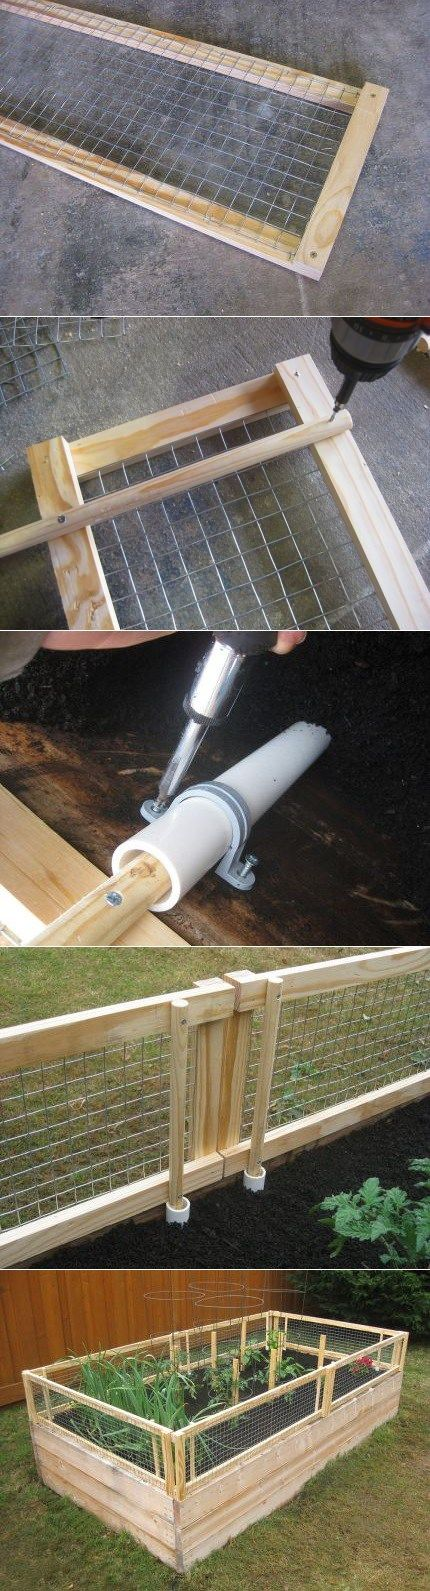 Removable Raised garden Bed Fence Rabbit ideas Pinterest